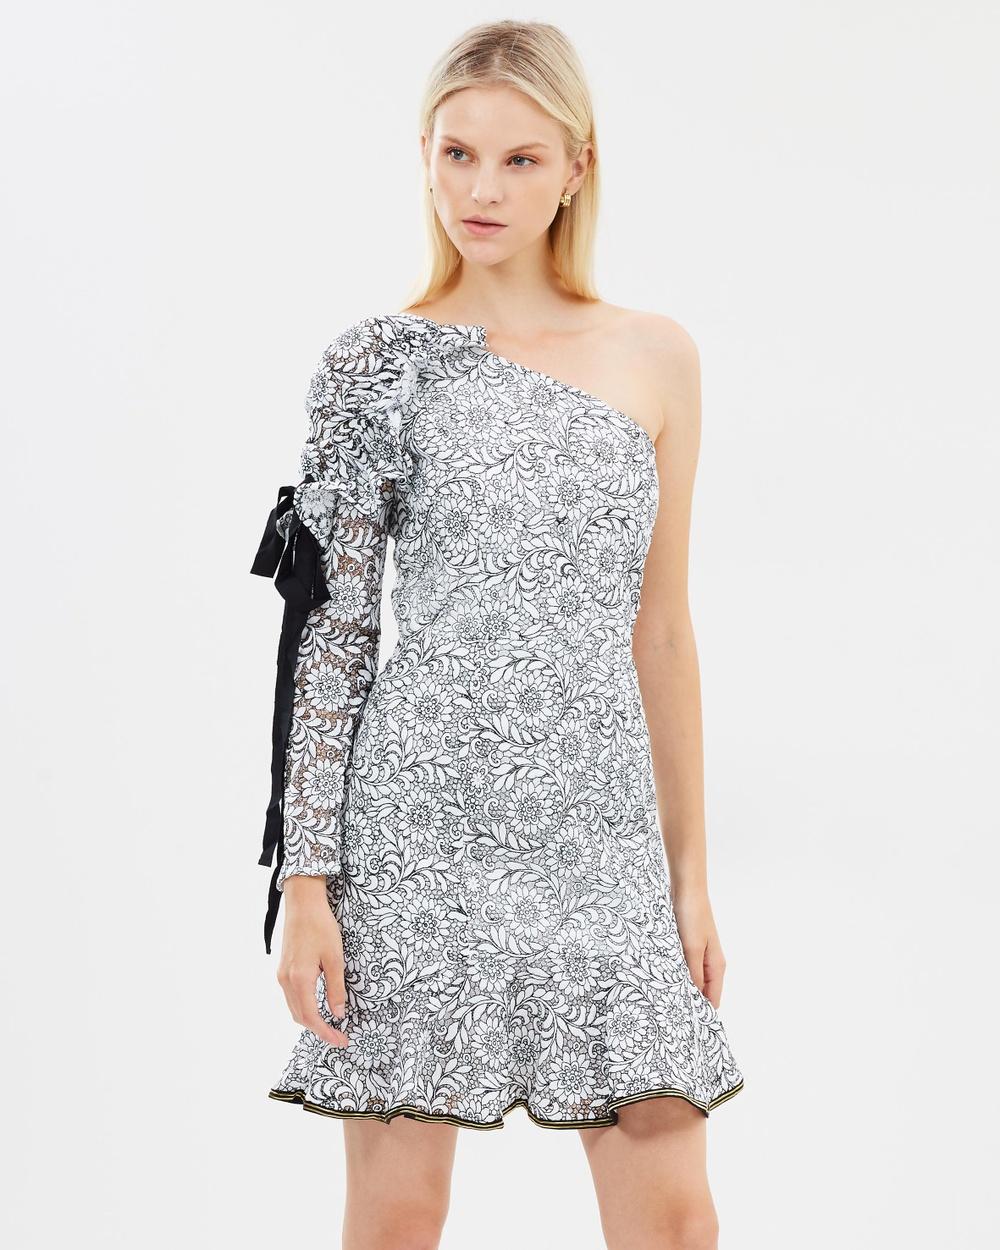 Rebecca Vallance Sofia One Shoulder Dress Dresses Black & White Sofia One Shoulder Dress